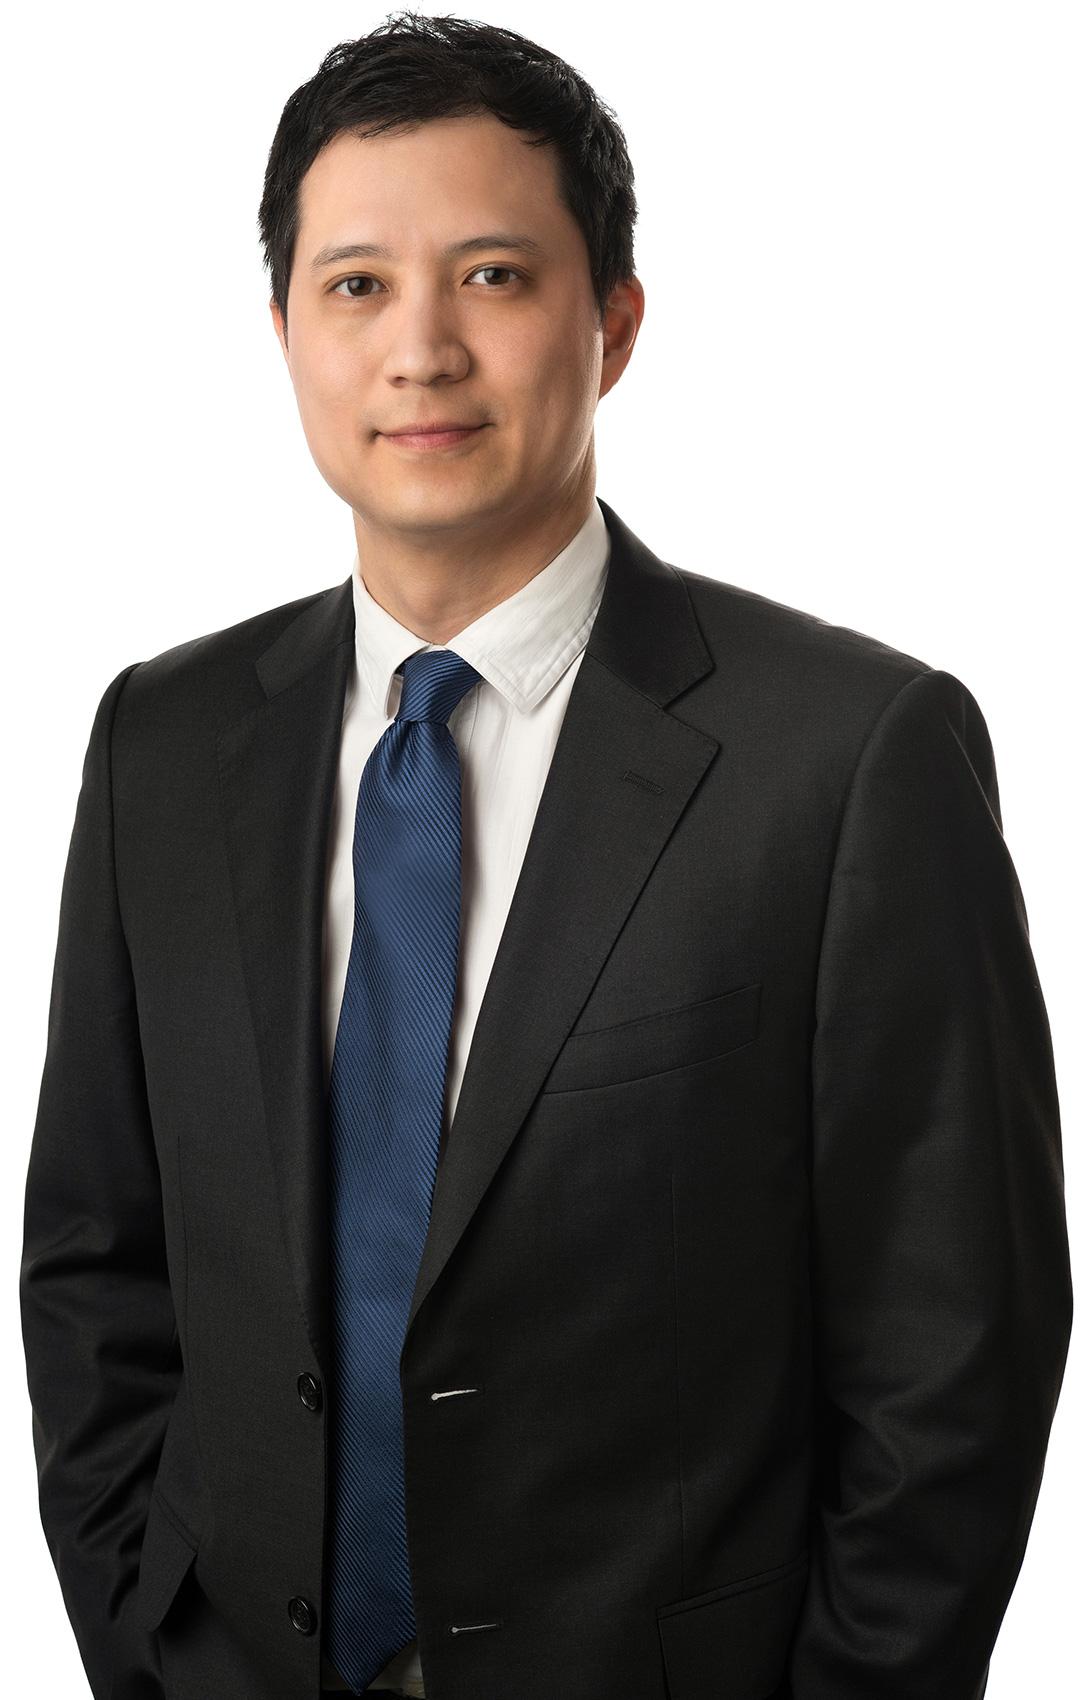 Tai Hyun (Alex) Shin